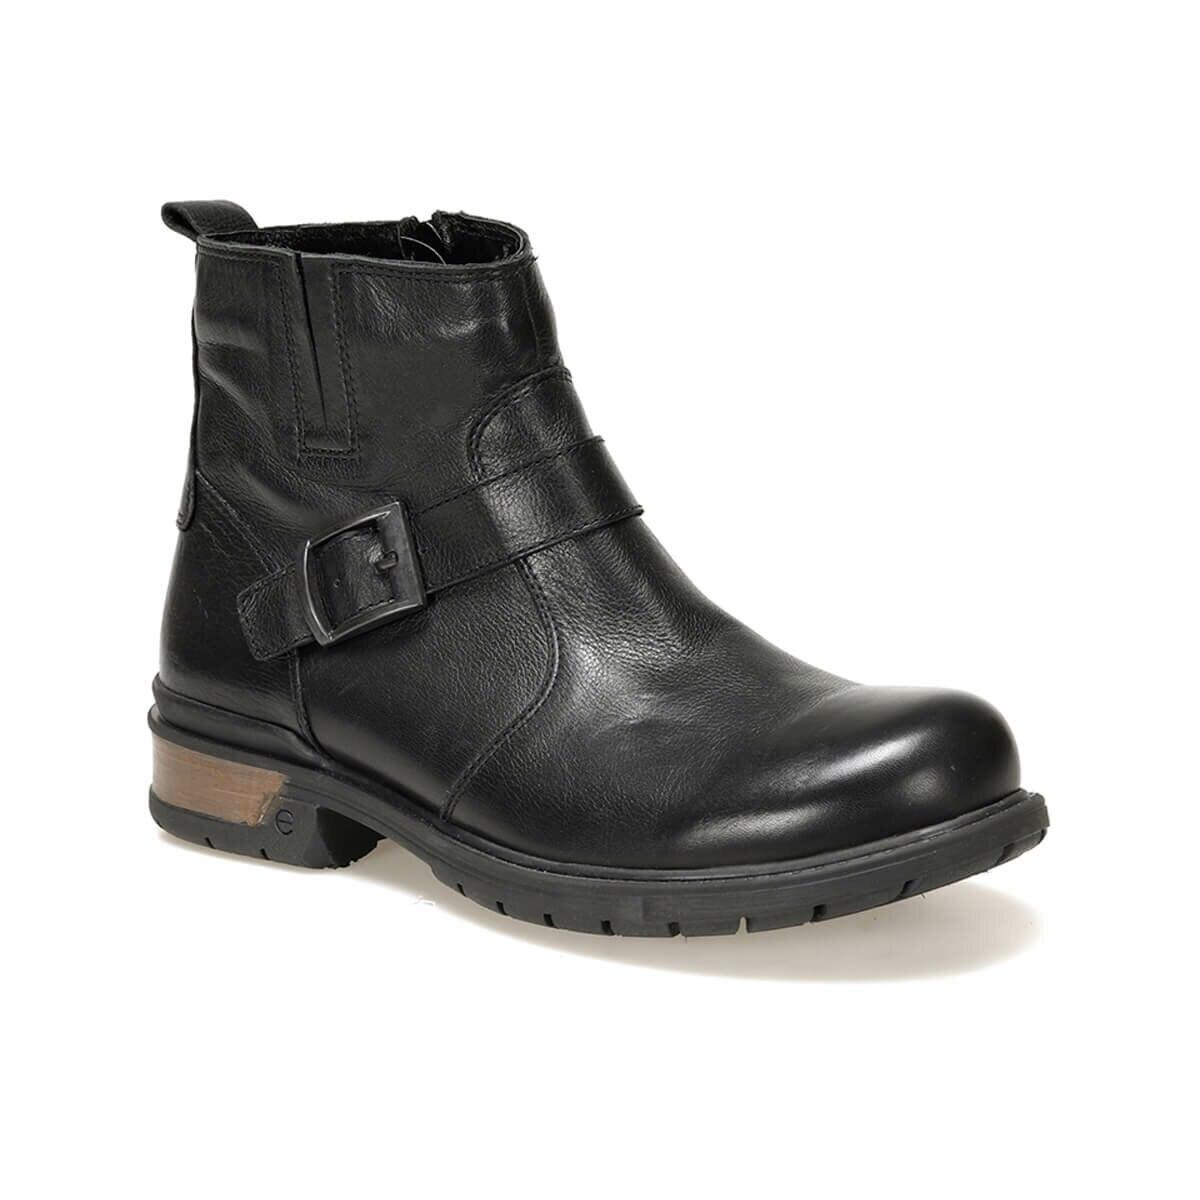 FLO Men Boots Fashion Leather Durable Winter Autumn Black Men Boots Мужские ботинки 3103 C 19 Forester